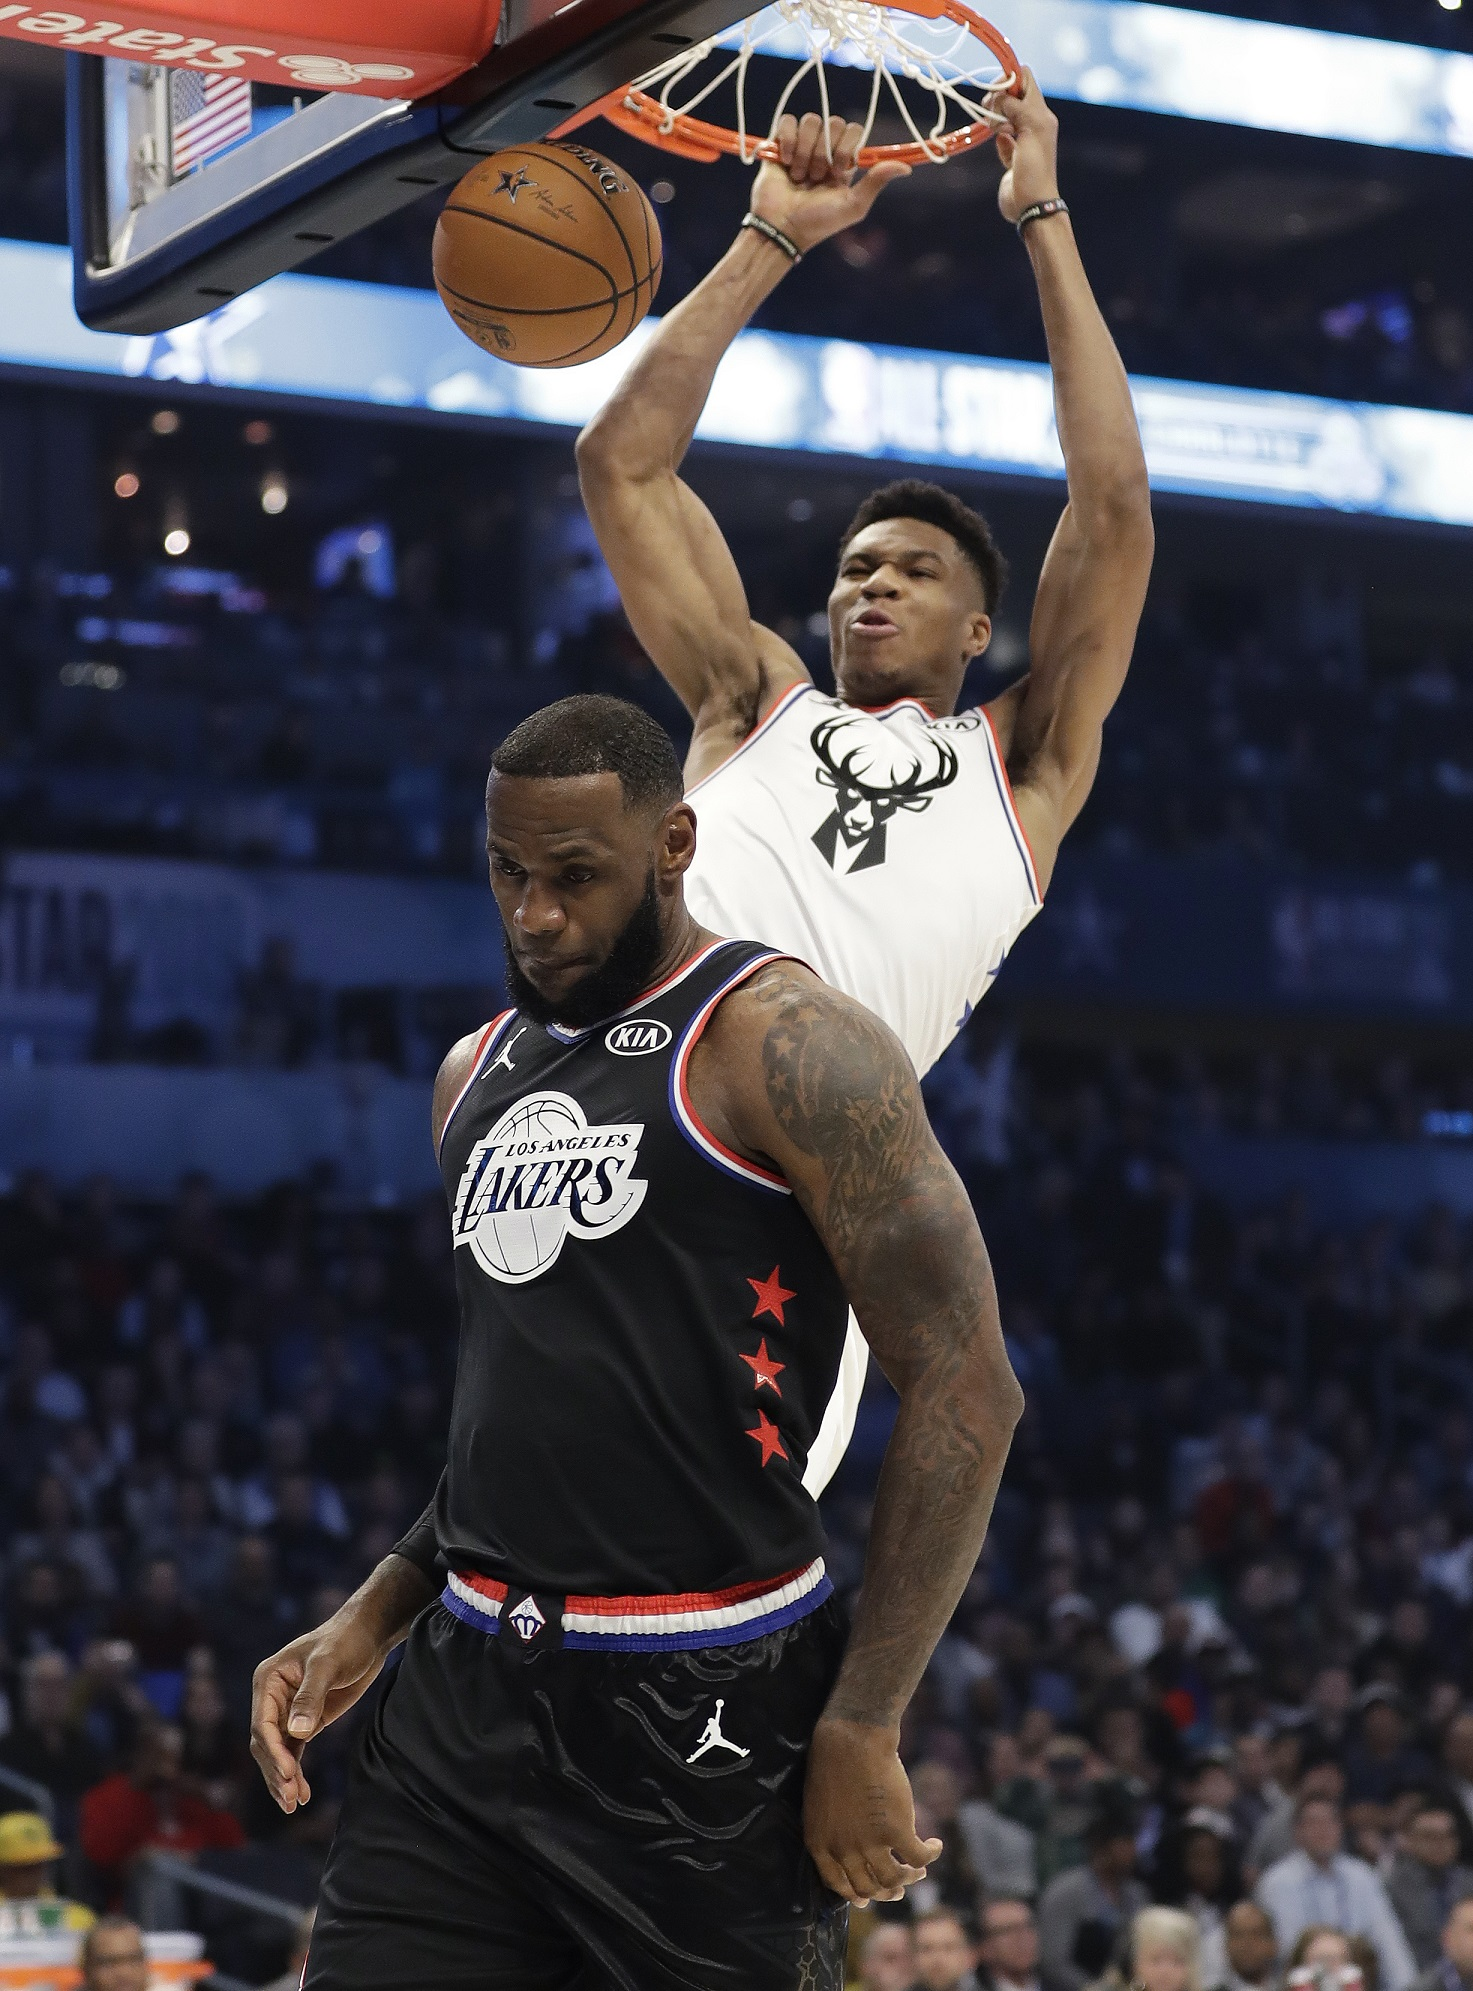 Rematch! Giannis vs. LeBron Antetokounmpo, All-Star captains again